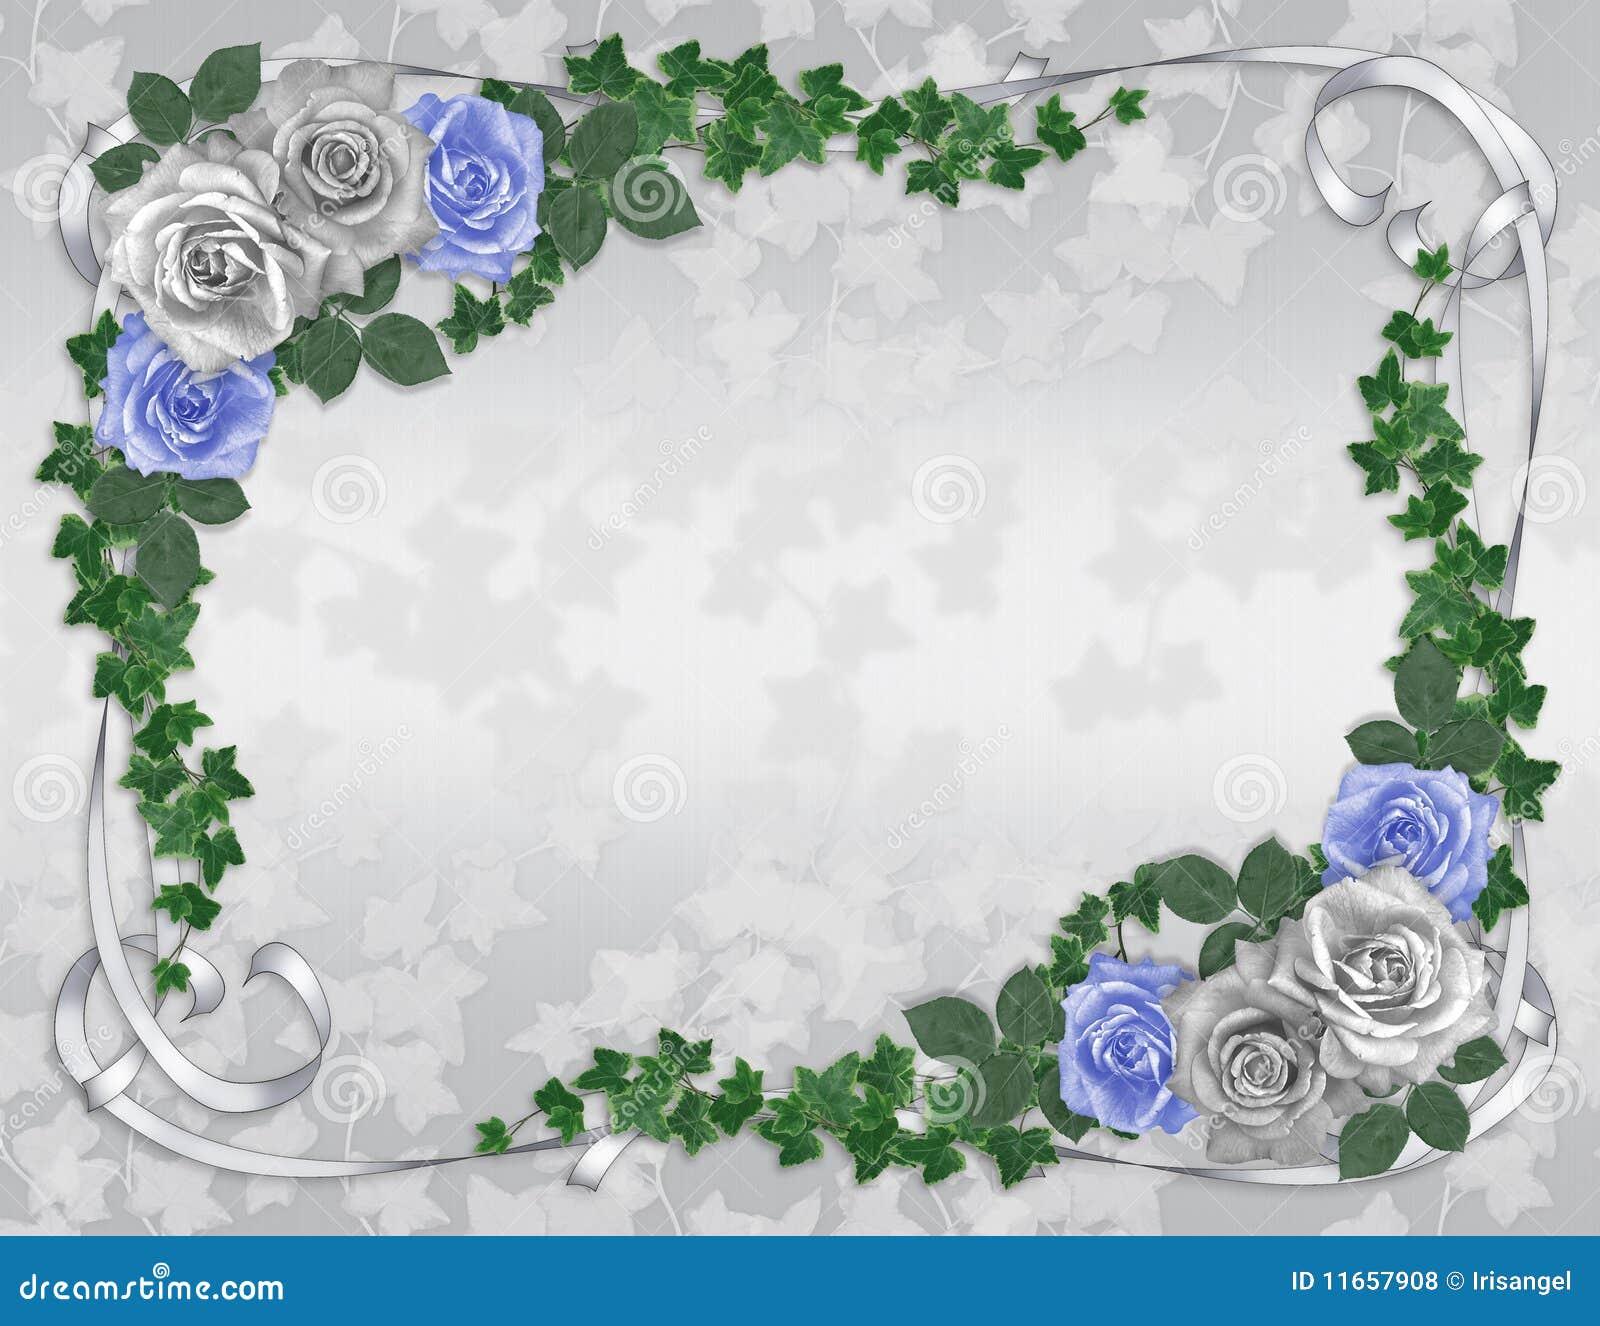 blue roses wedding invitation template stock illustration